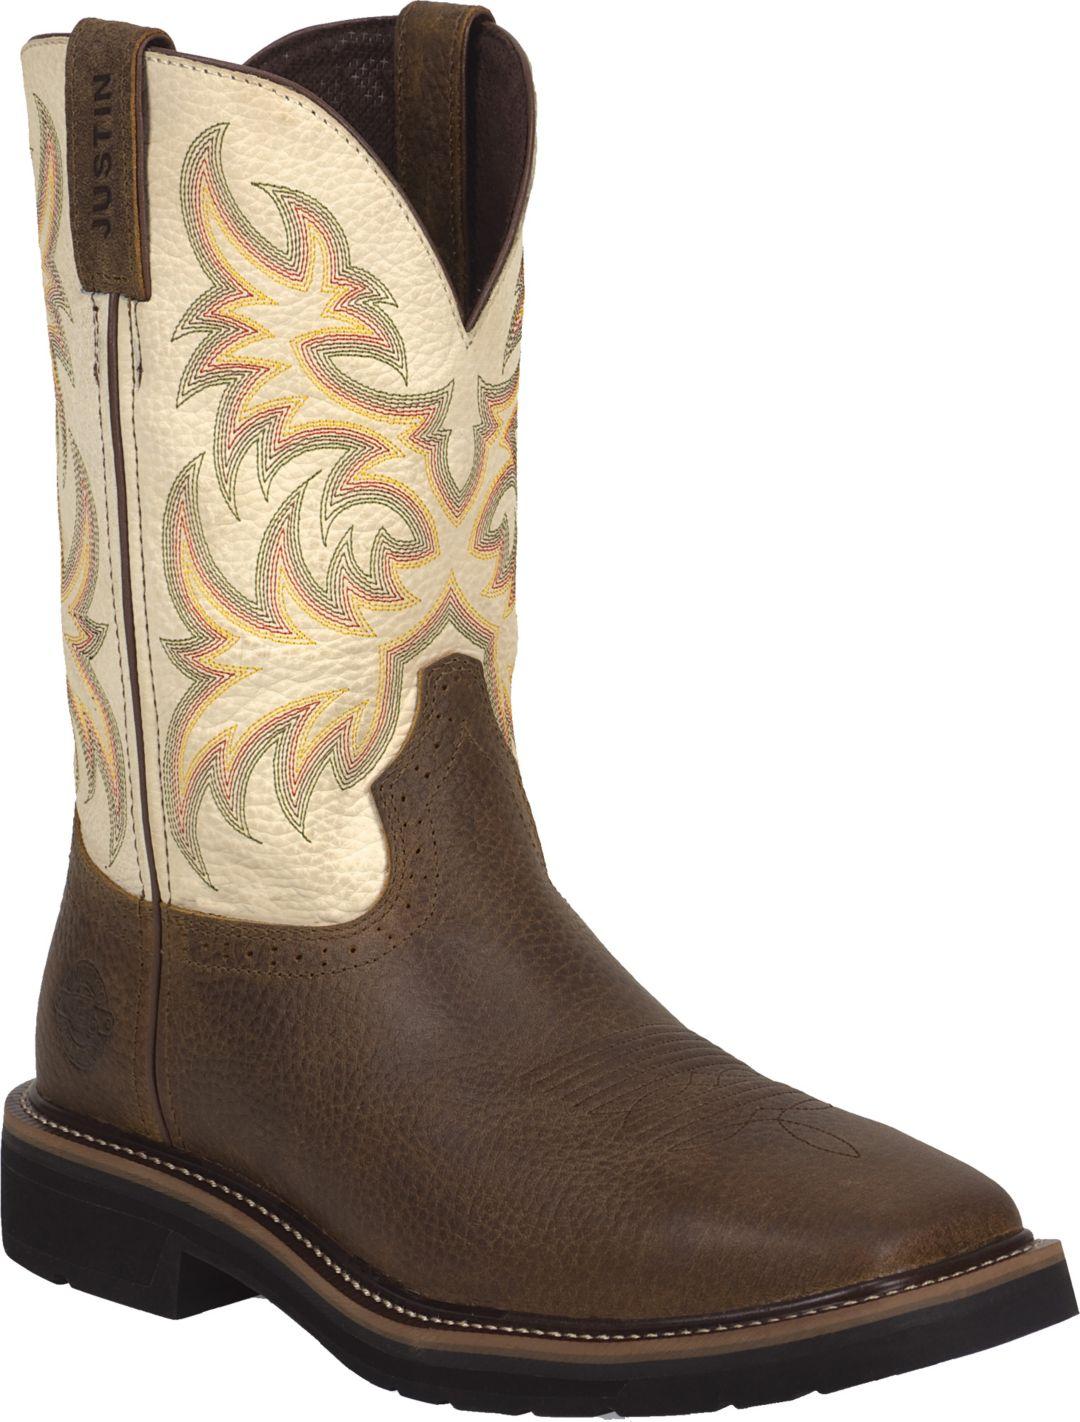 dcd3e0c8ca01a Justin Men's Stampede Square Toe EH Work Boots